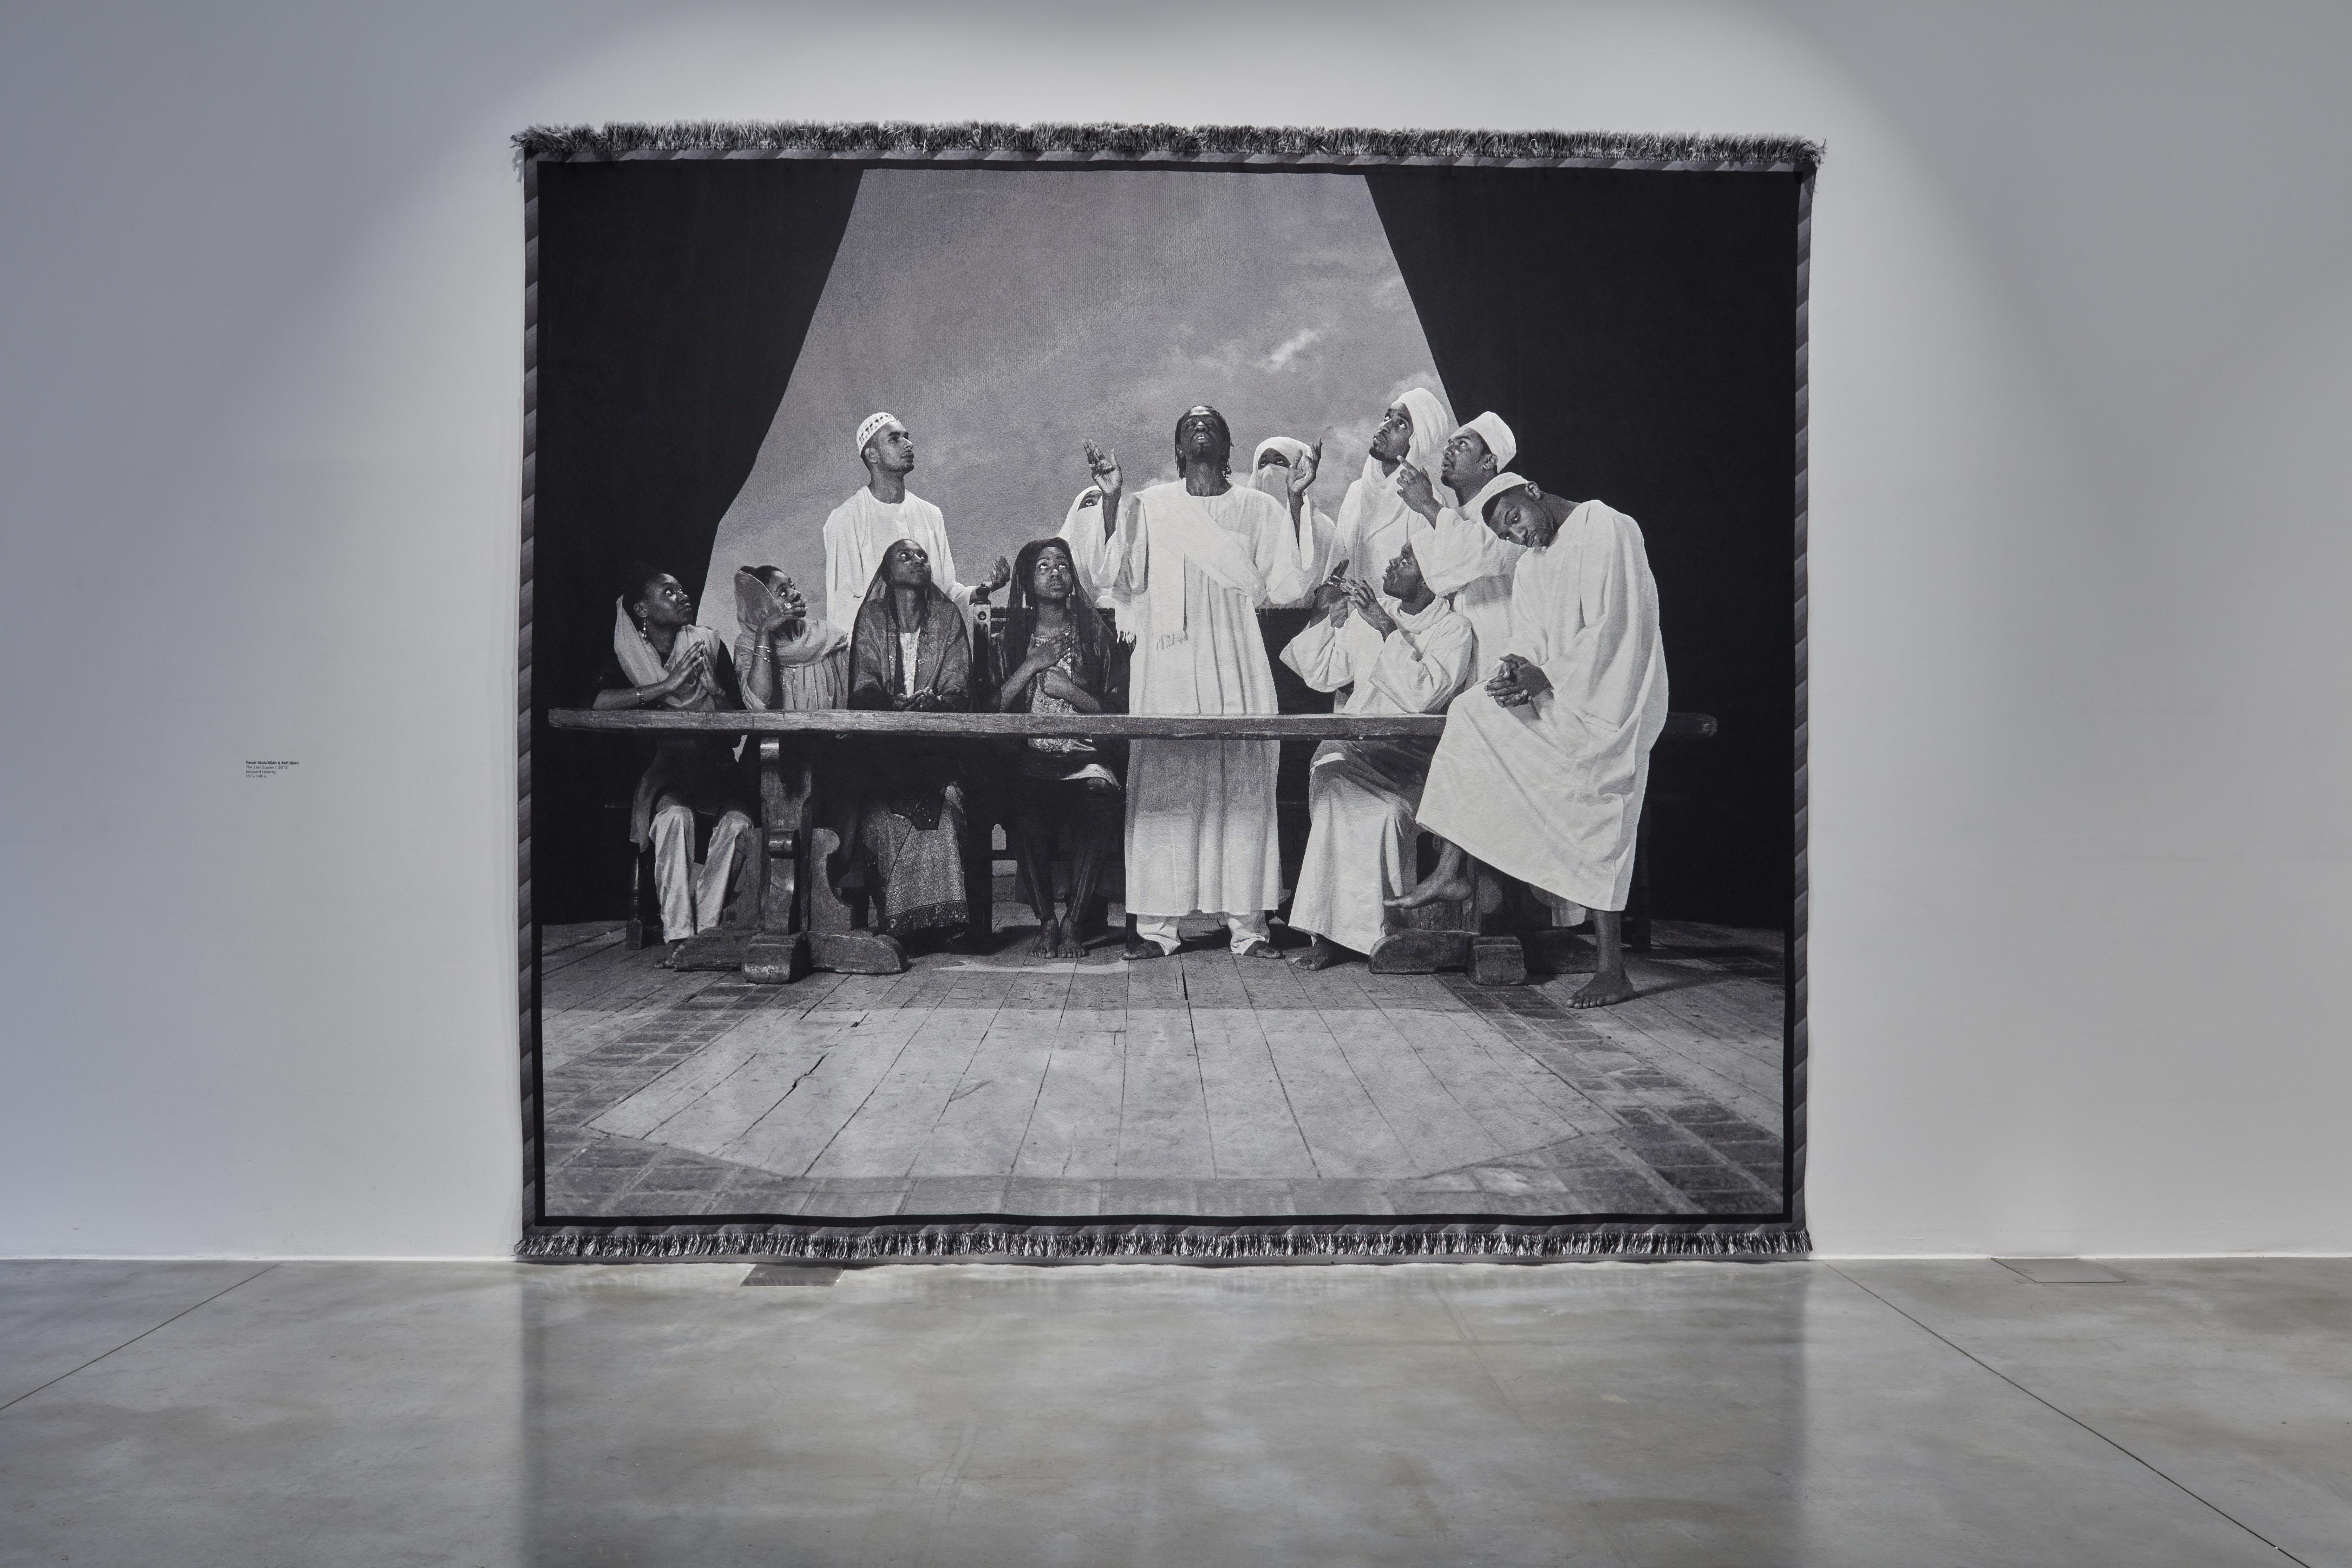 Faisal Abdu'Allah & Kofi Allen, The Last Supper I, 2012 . Jacquard tapestry, 117 x 148 in.